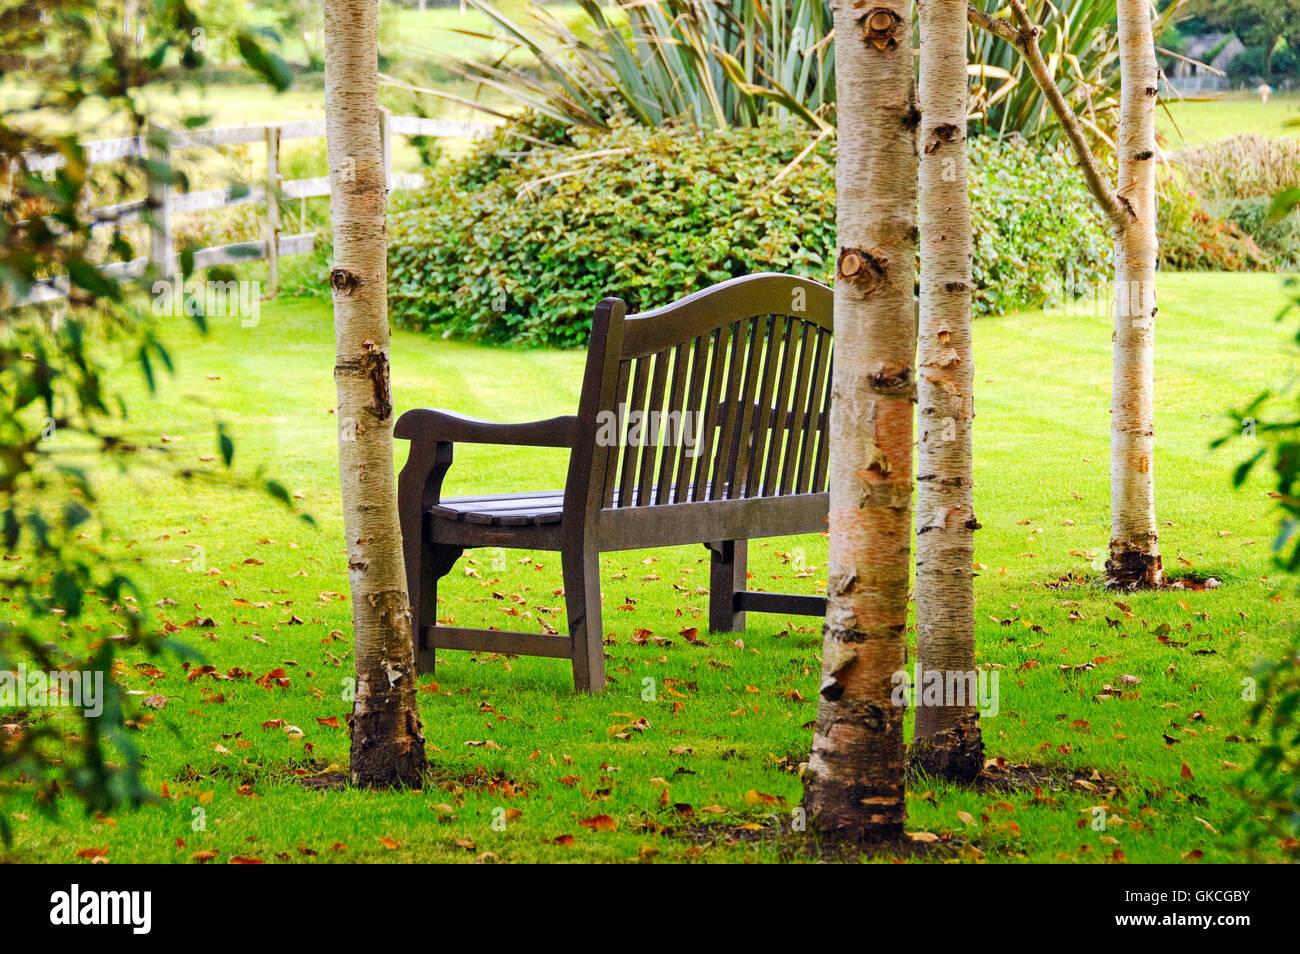 Bench in garden at Gregans Castle Hotel, Ballyvaughan, Ireland - Stock Image